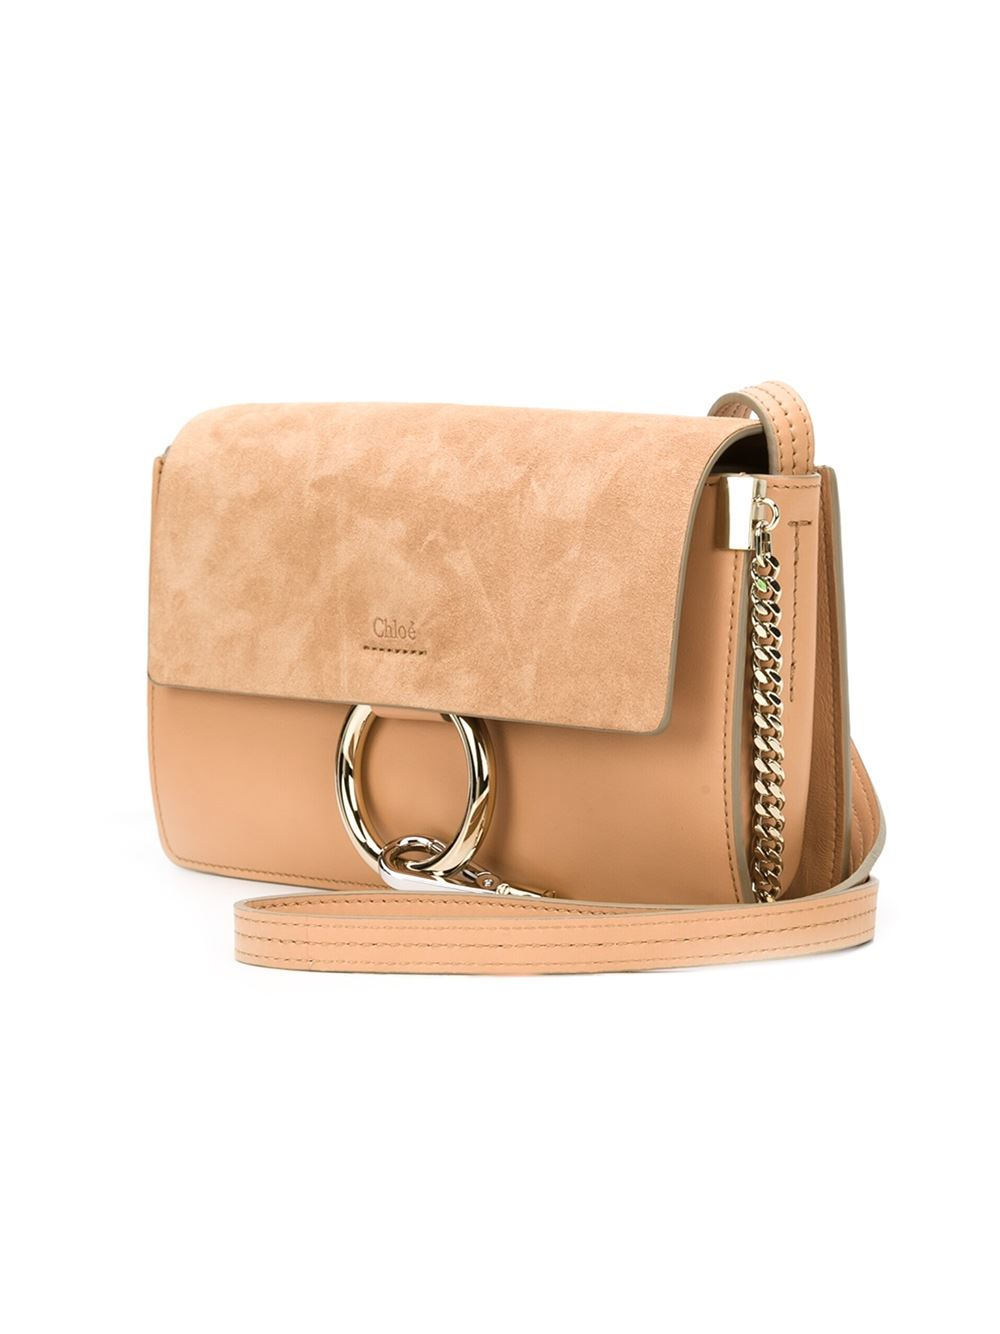 Chlo¨¦ Faye Suede Shoulder Bag in Beige (NUDE \u0026amp; NEUTRALS) | Lyst